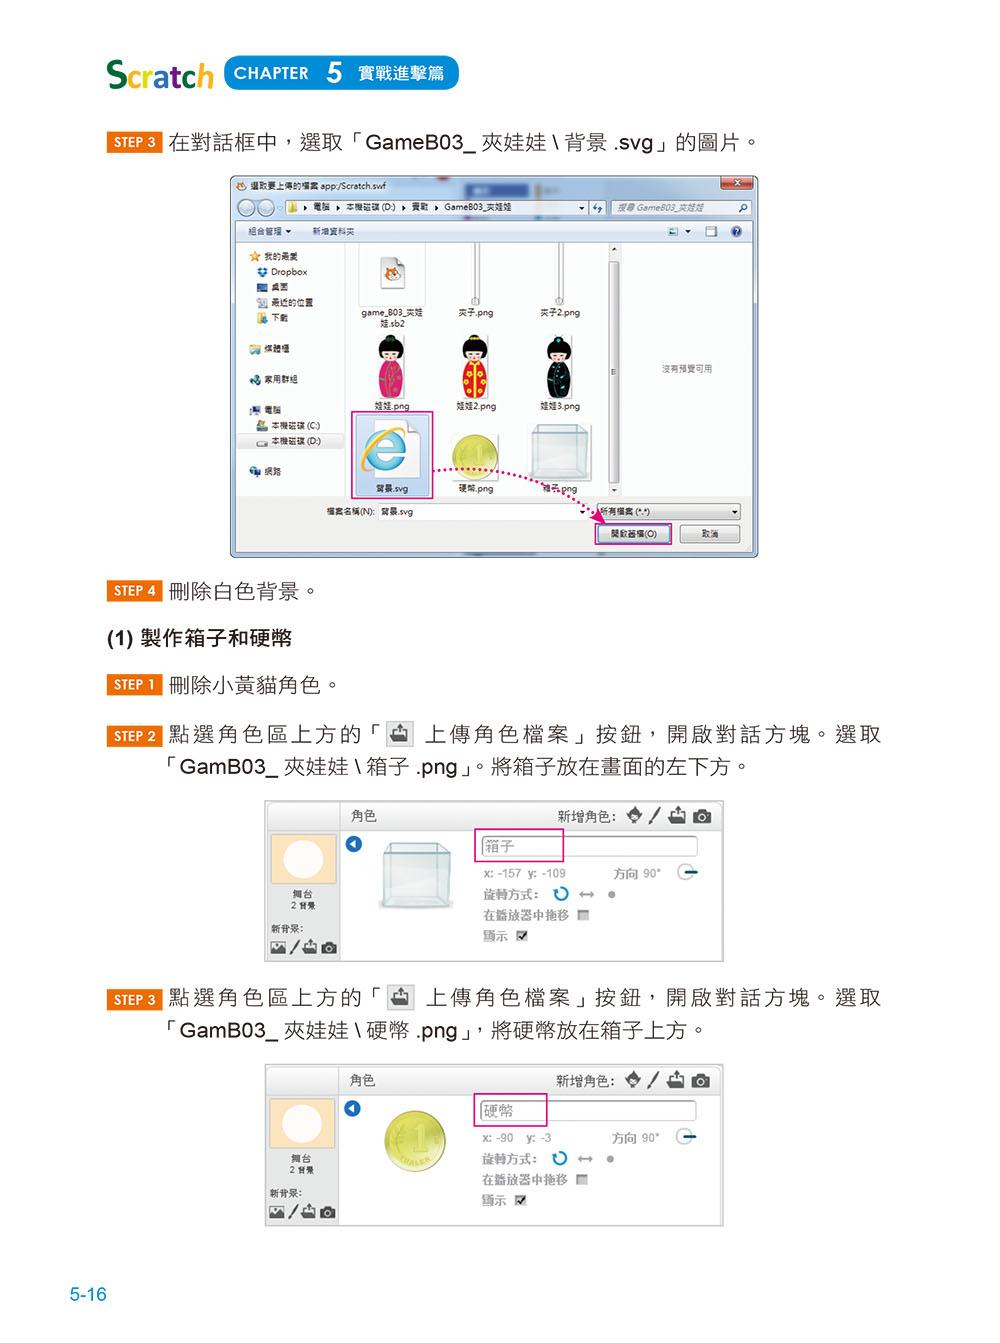 http://im2.book.com.tw/image/getImage?i=http://www.books.com.tw/img/001/070/34/0010703424_b_07.jpg&v=5694f1dd&w=655&h=609